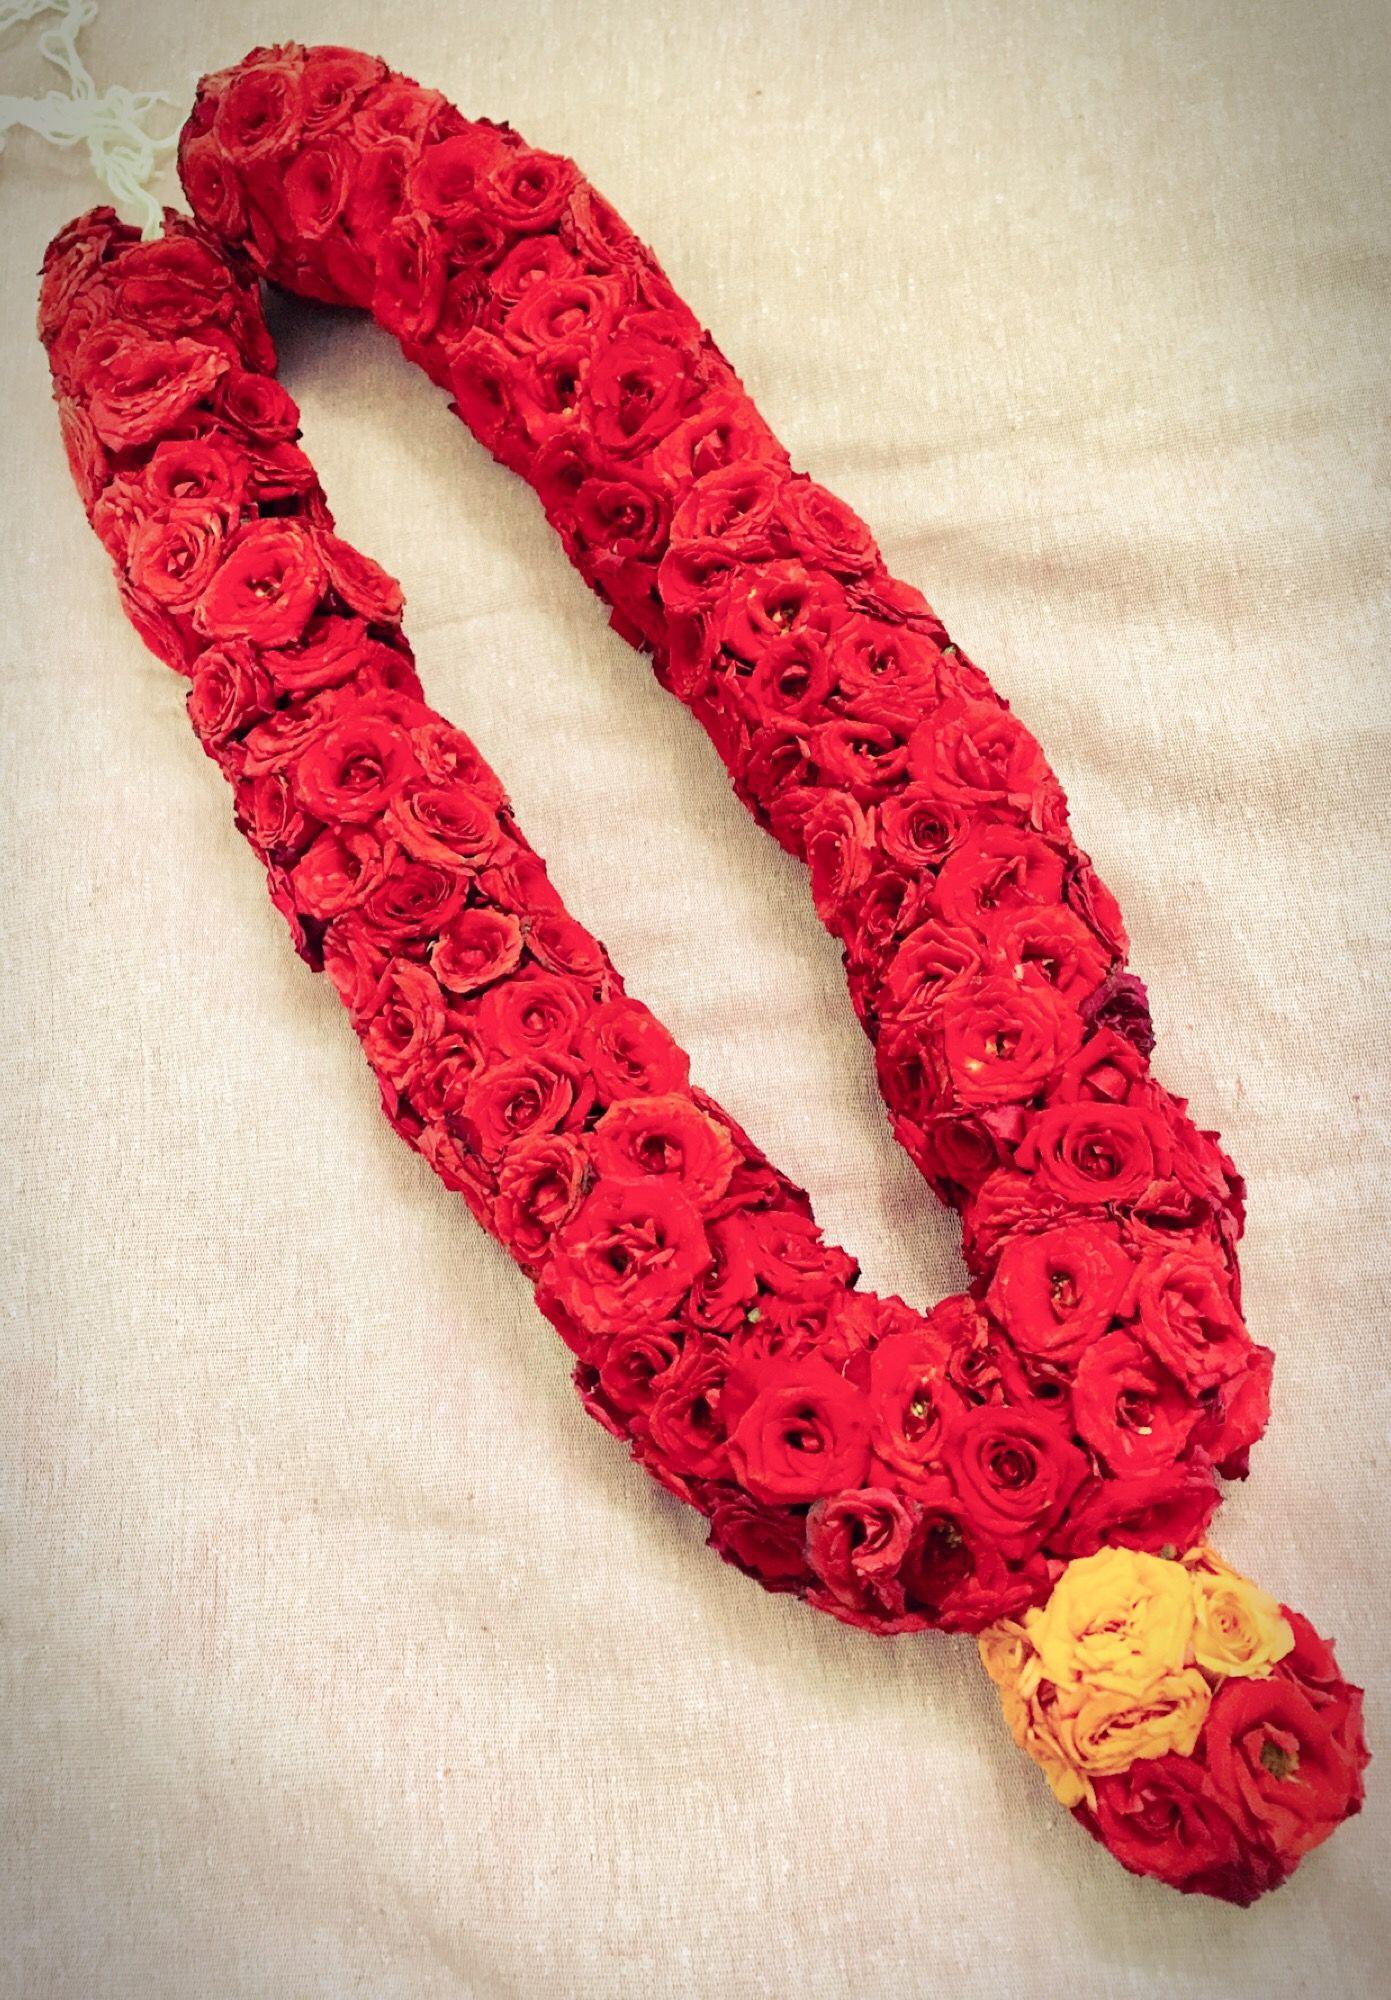 Poo Malai Malai Red Roses Red